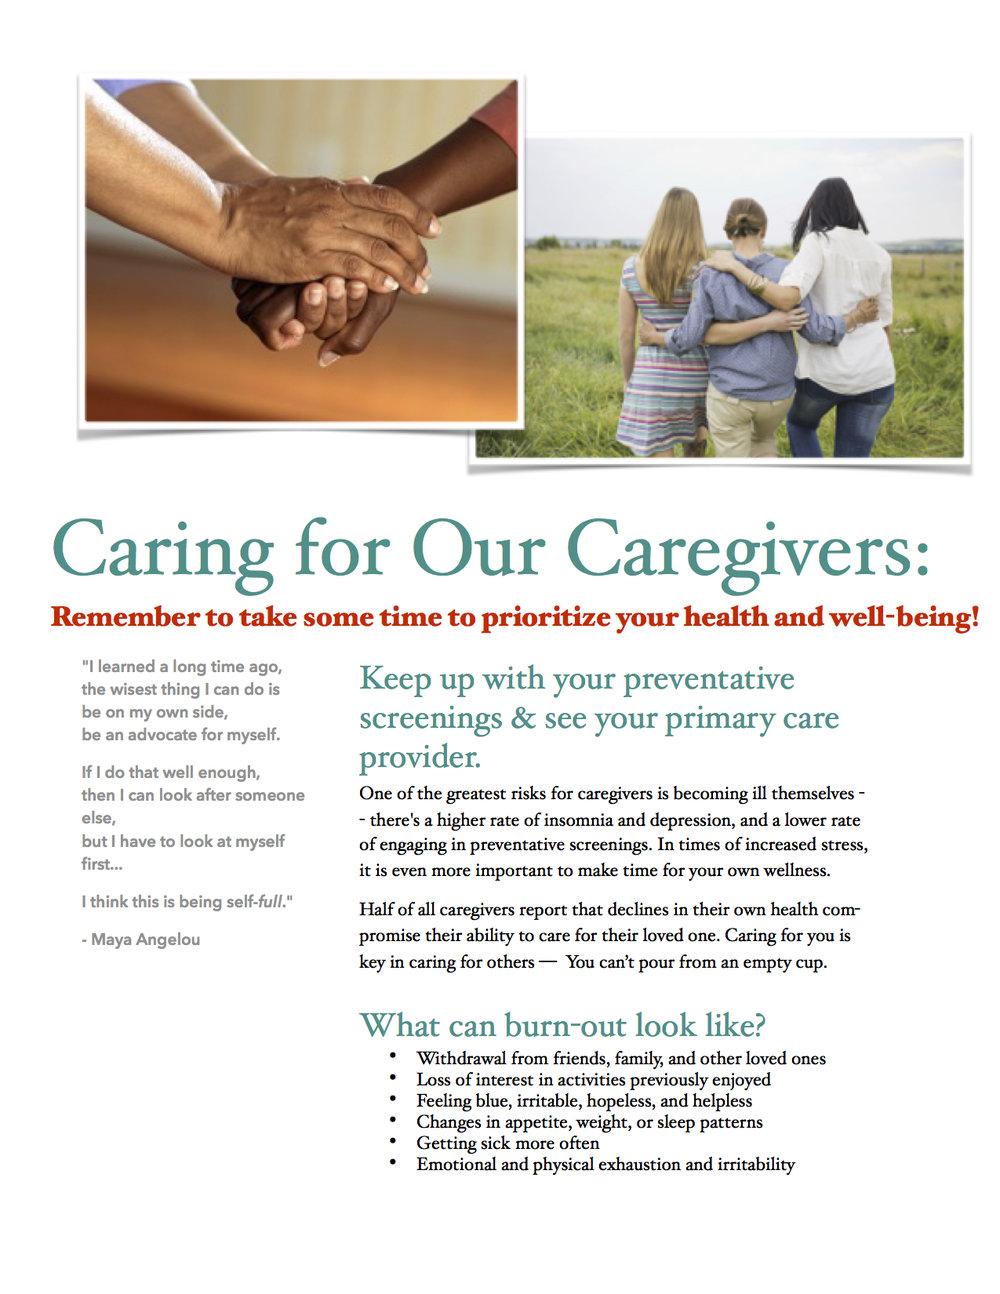 caregivers document.jpg